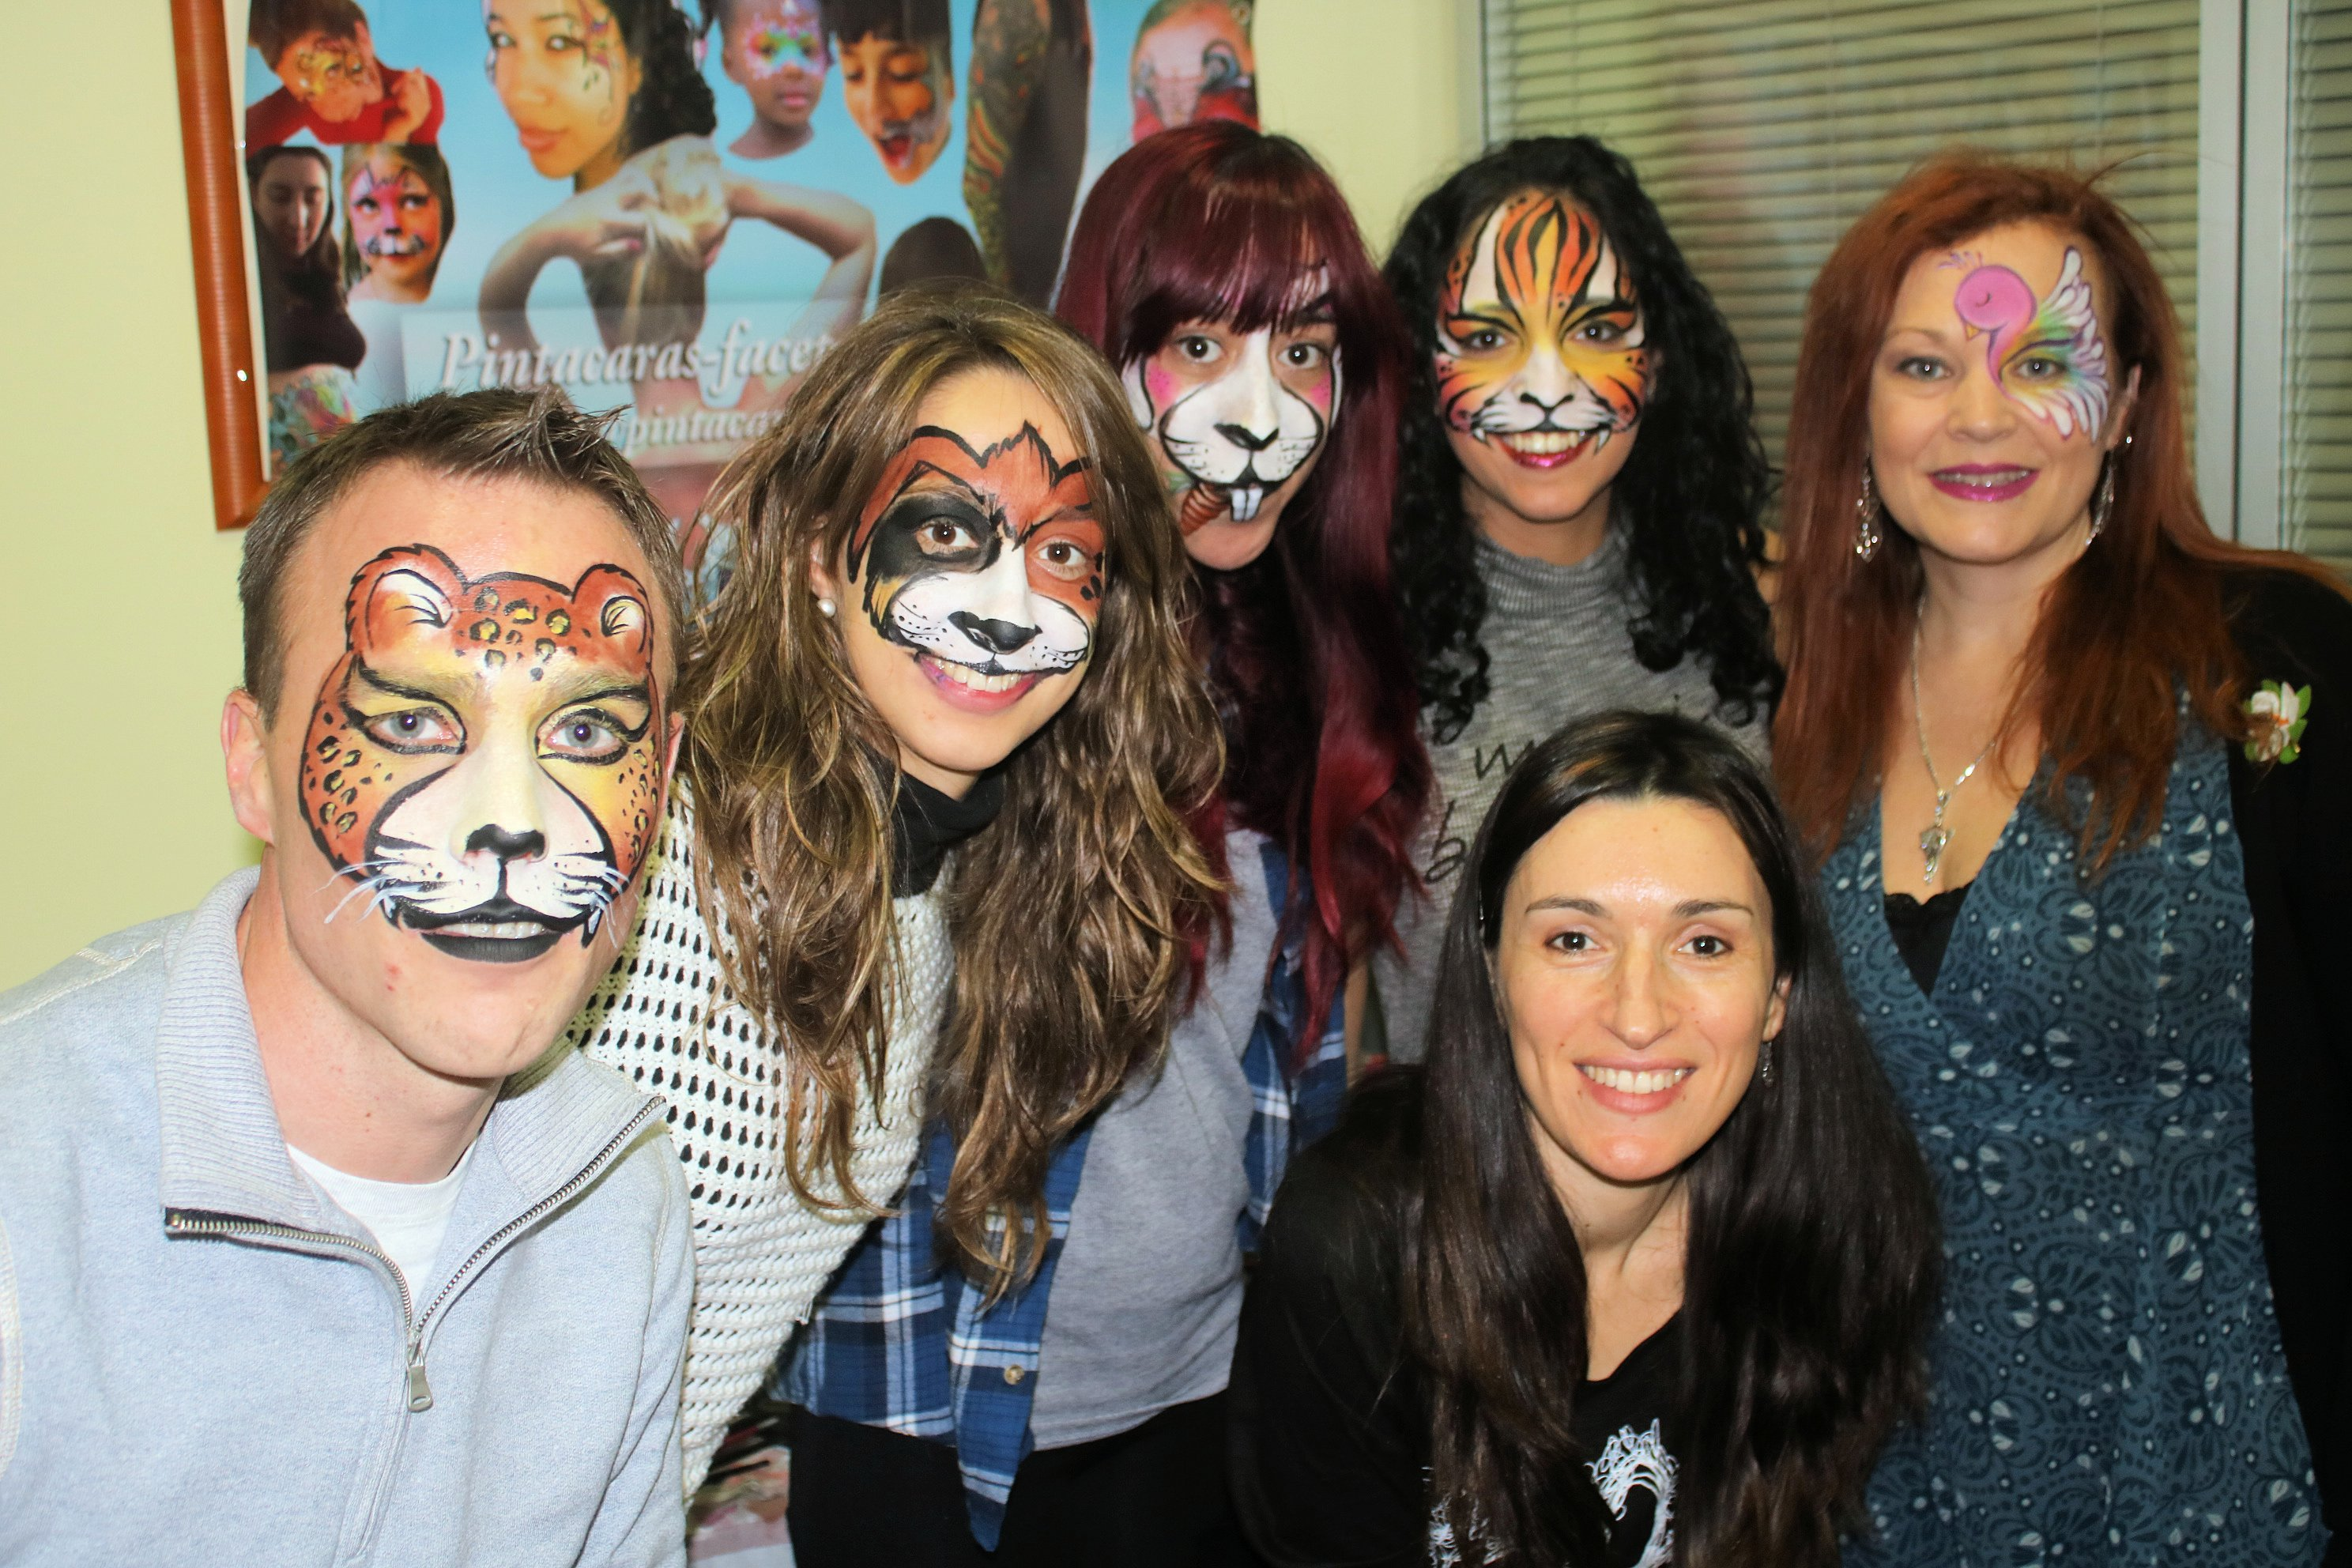 Cursos de Facepaint, cursos de maquillaje de fantasía